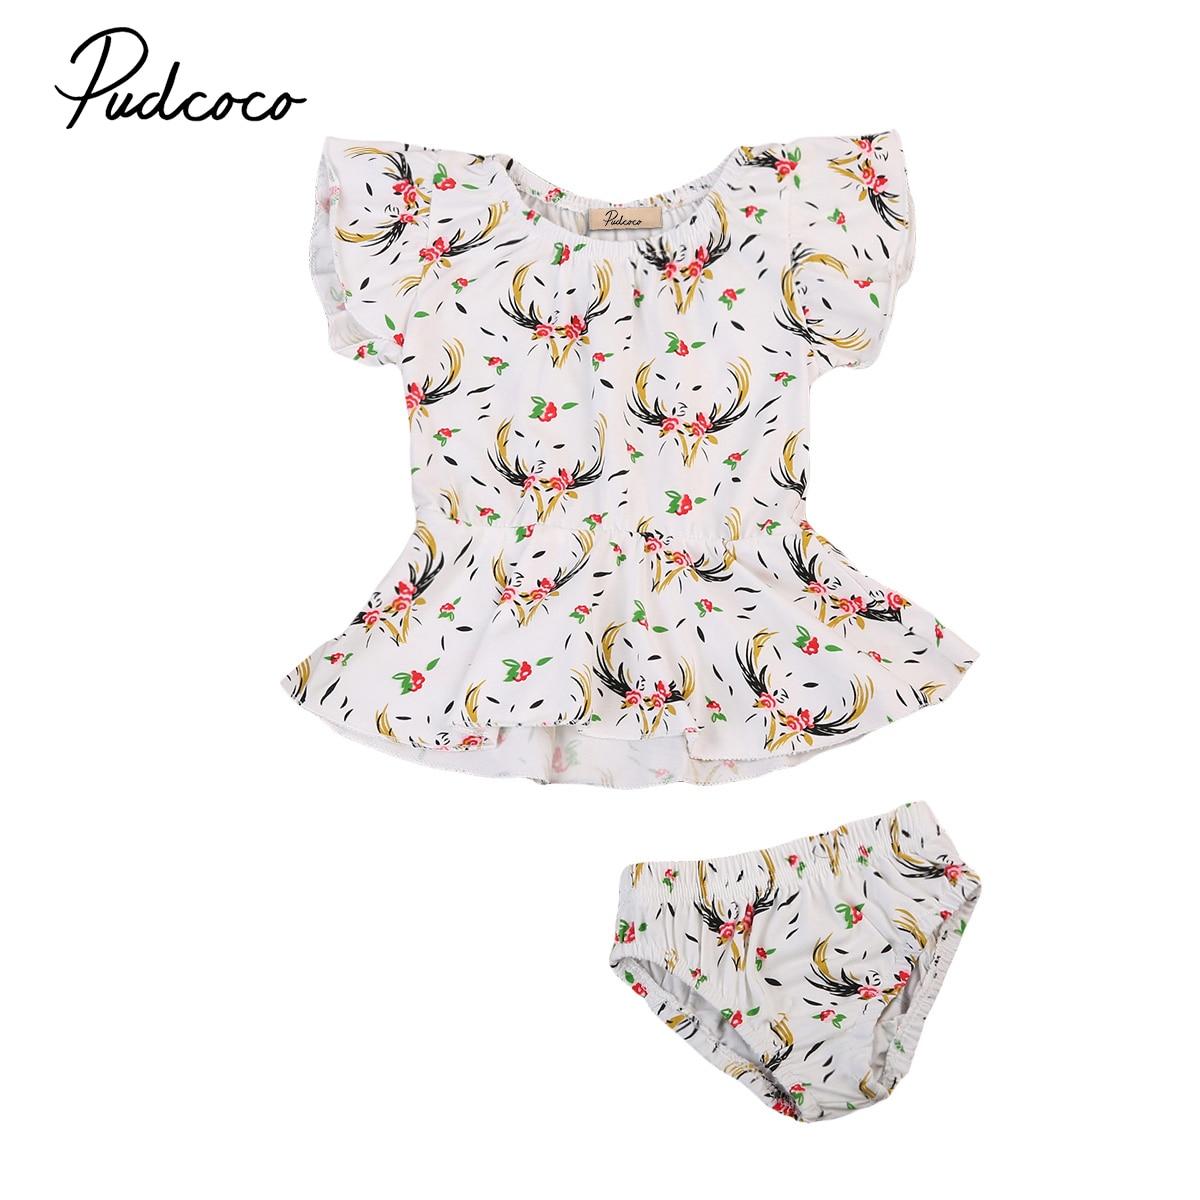 Summer Newborn Infant Baby Girls Outfit Clothes Floral Romper Jumpsuit Bodysuit+Shorts Bottoms Cute Children Clothing 2pcs